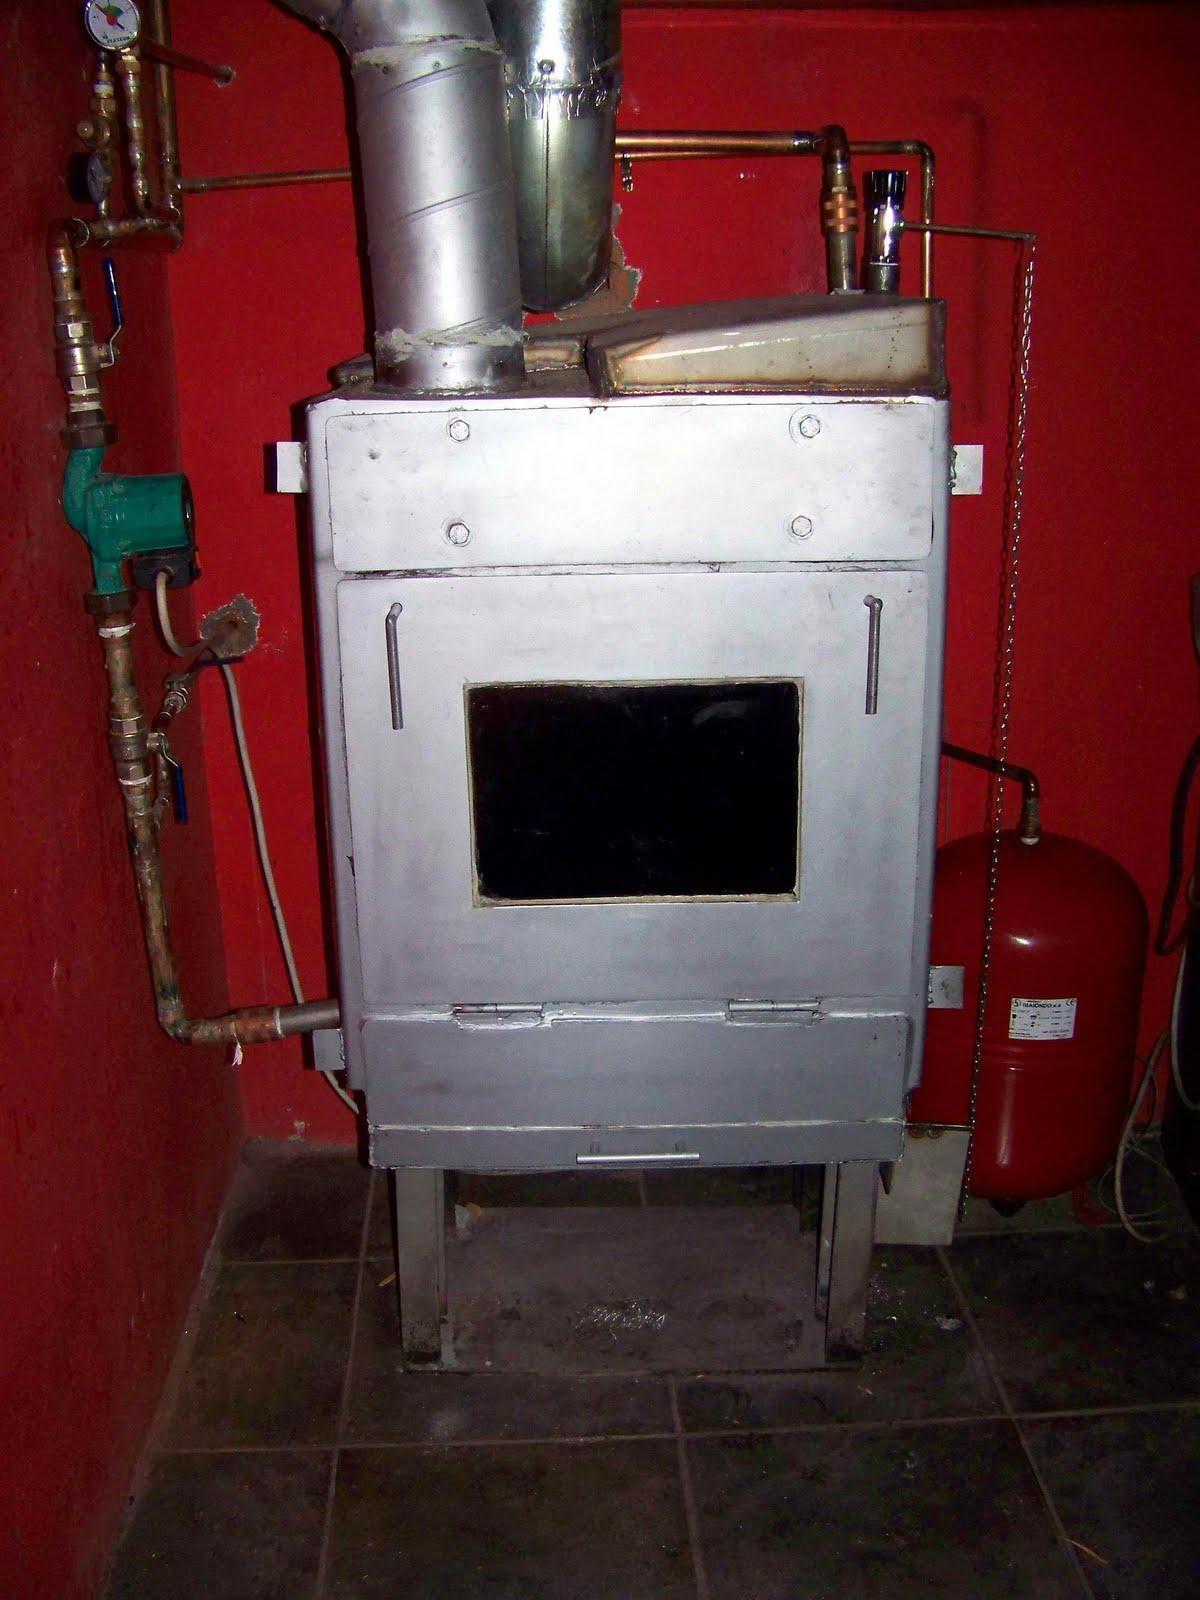 Tecnolog a para un progreso sostenible caldera de acero - Estufa de lena para radiadores ...